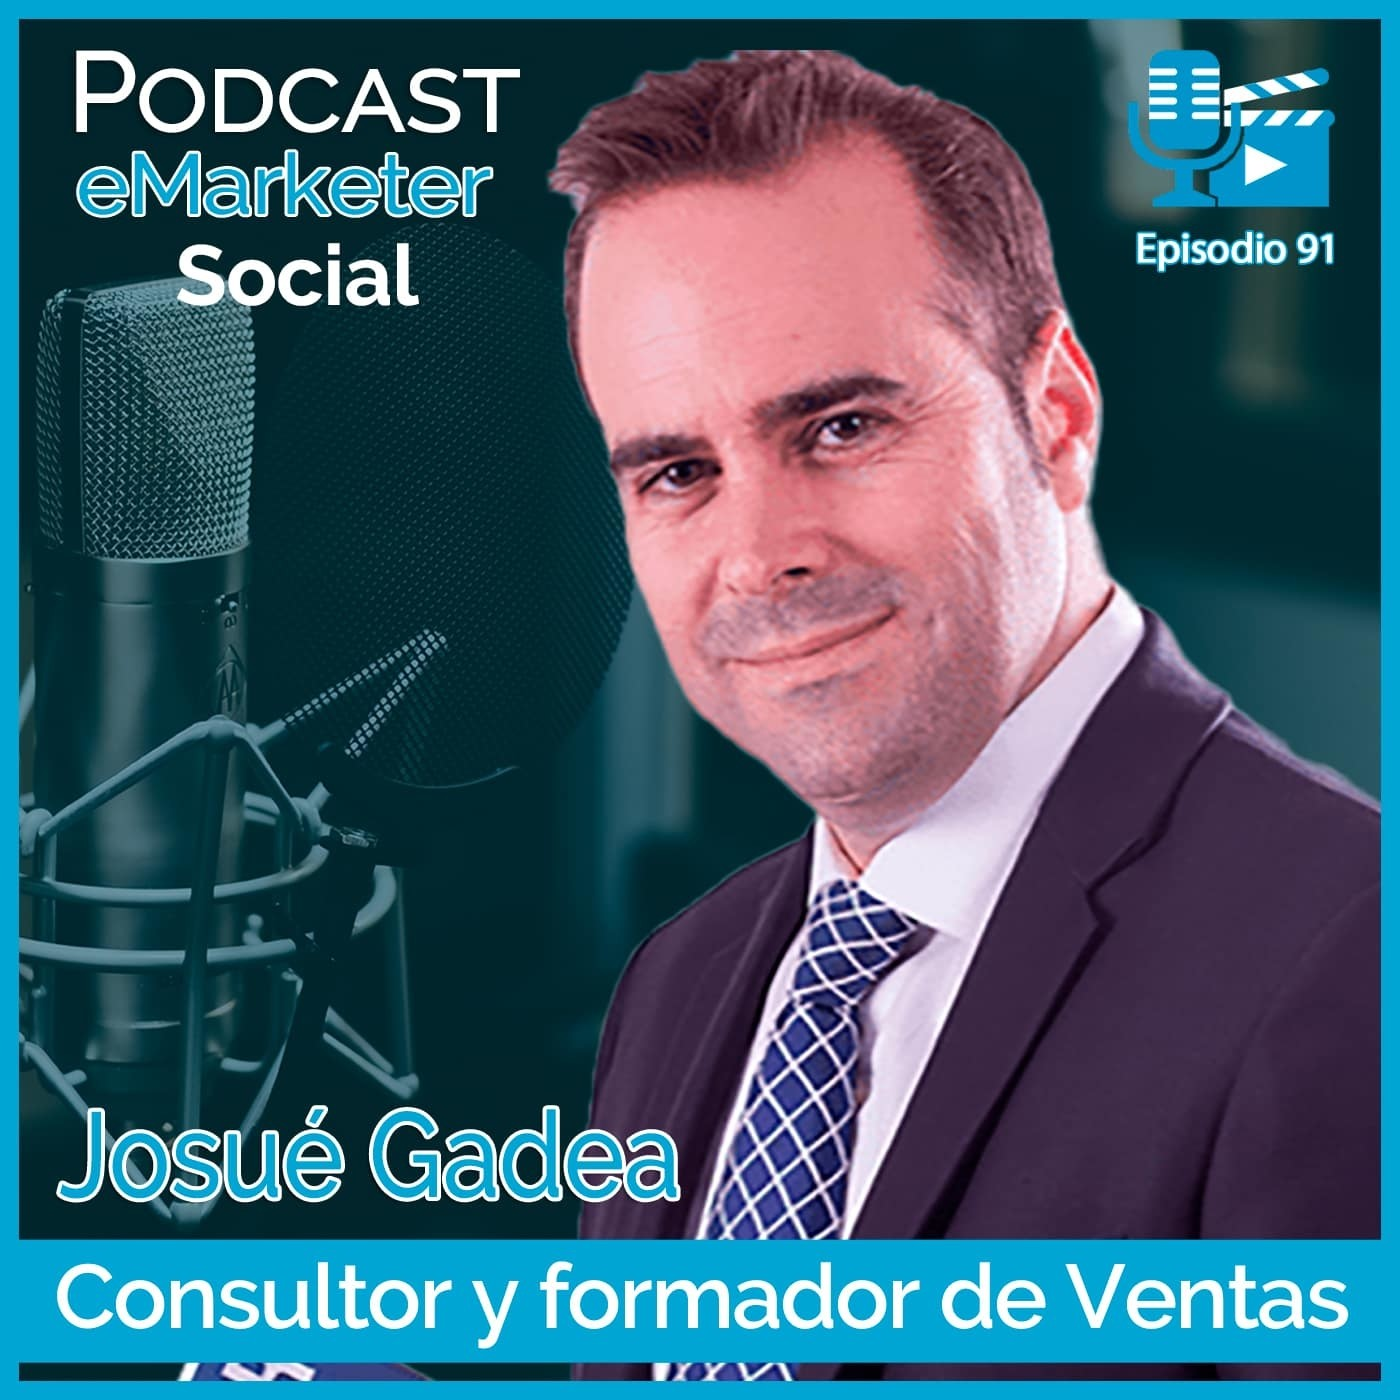 091 Entrevista a Josué Gadea: Su historia (1ª parte) en Podcast eMarketerSocial